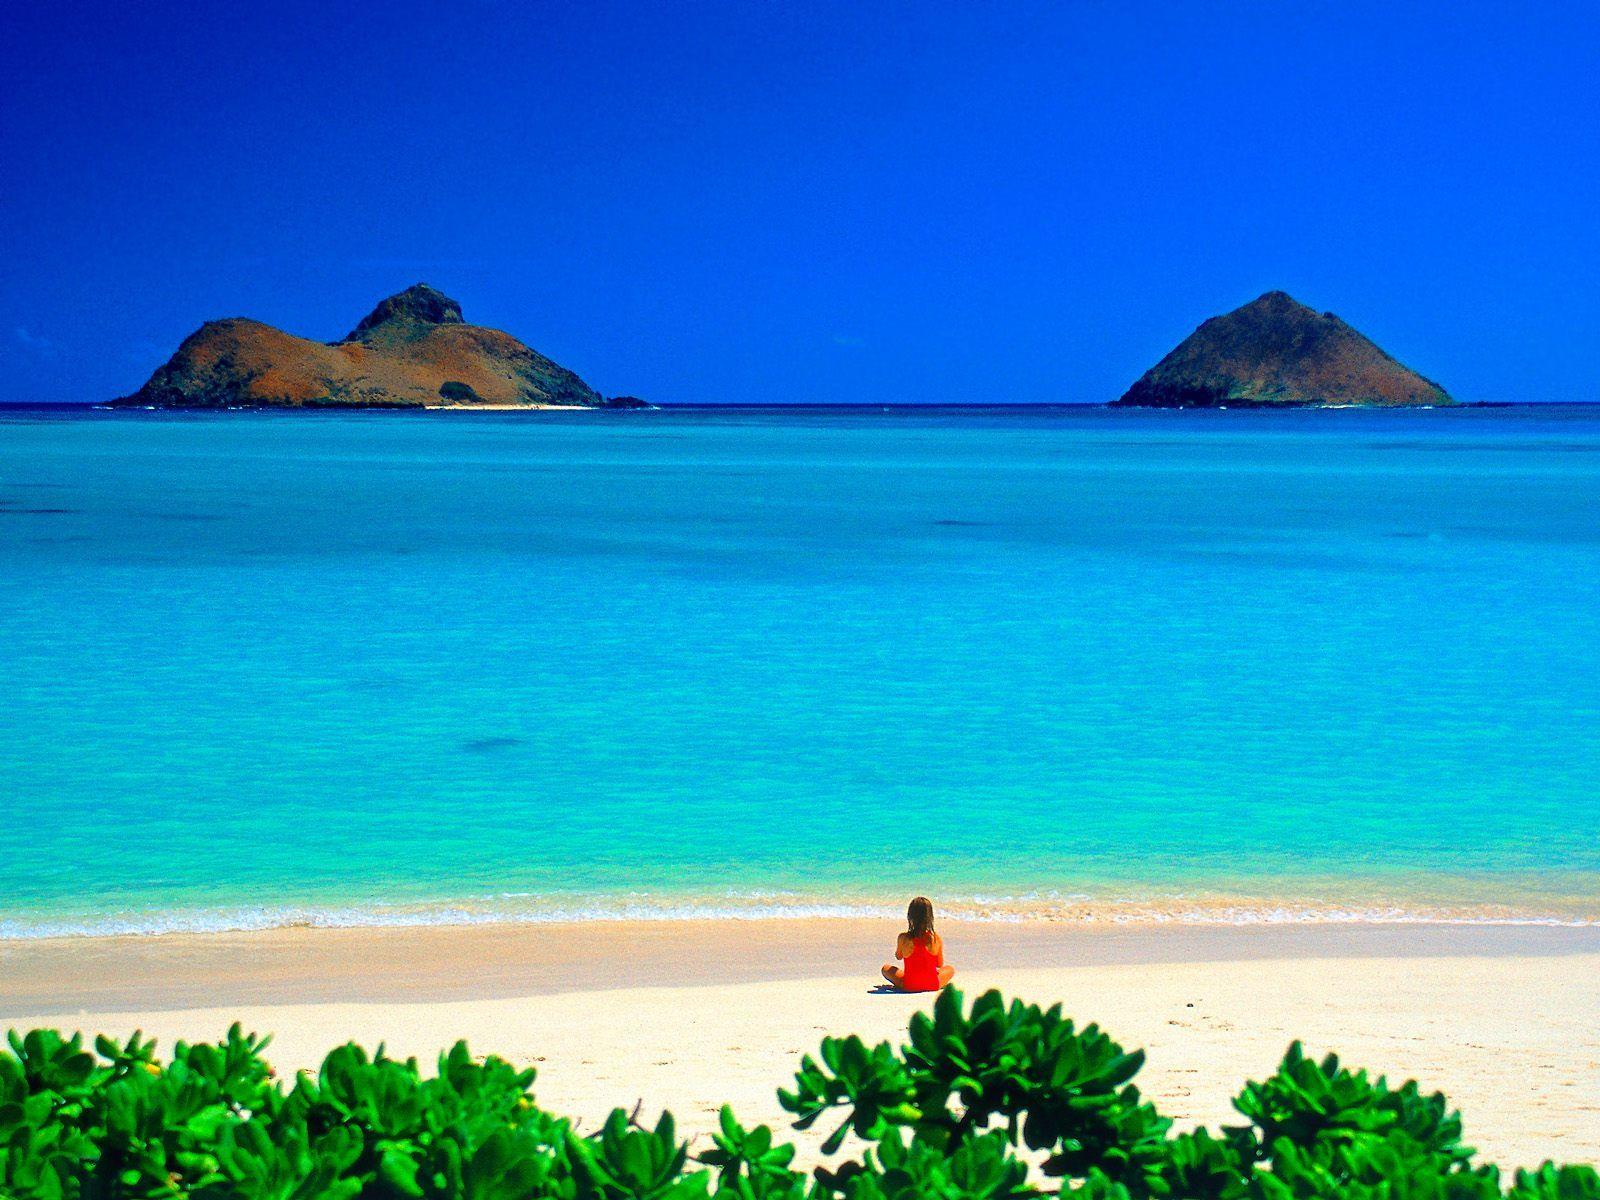 Hawaii.....warm, sandy beaches, clear water.....